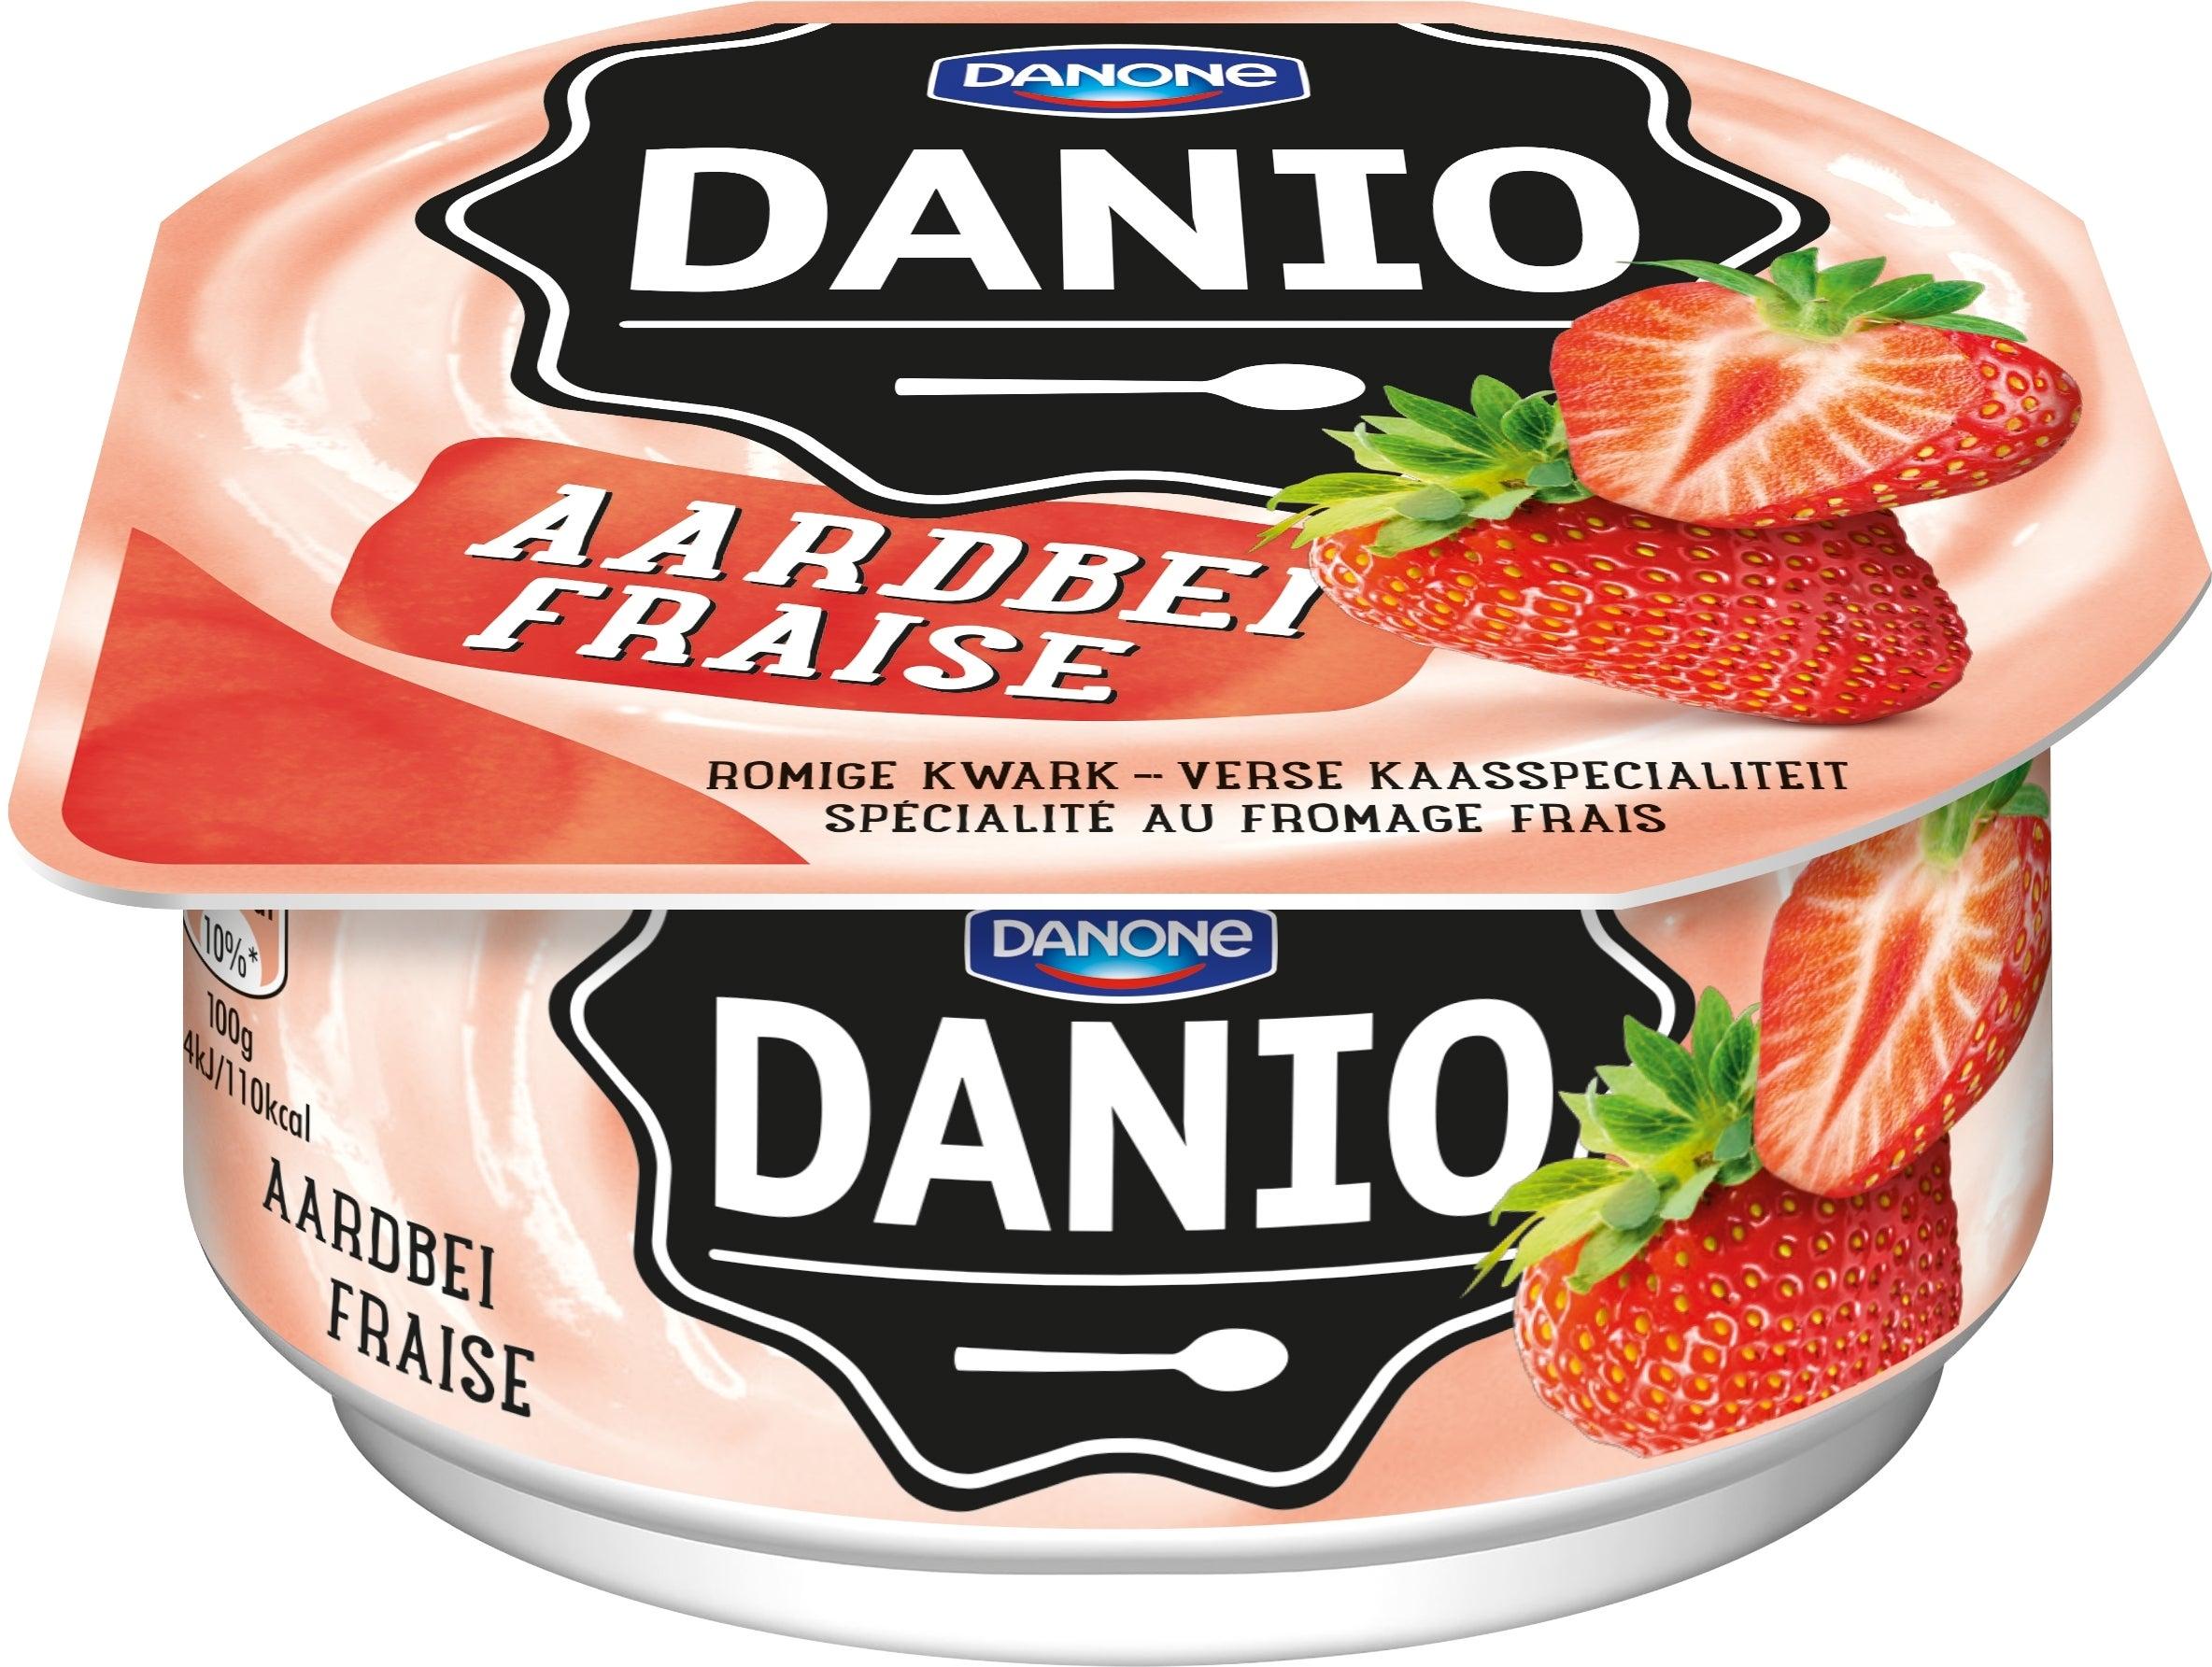 Danio Aardbei